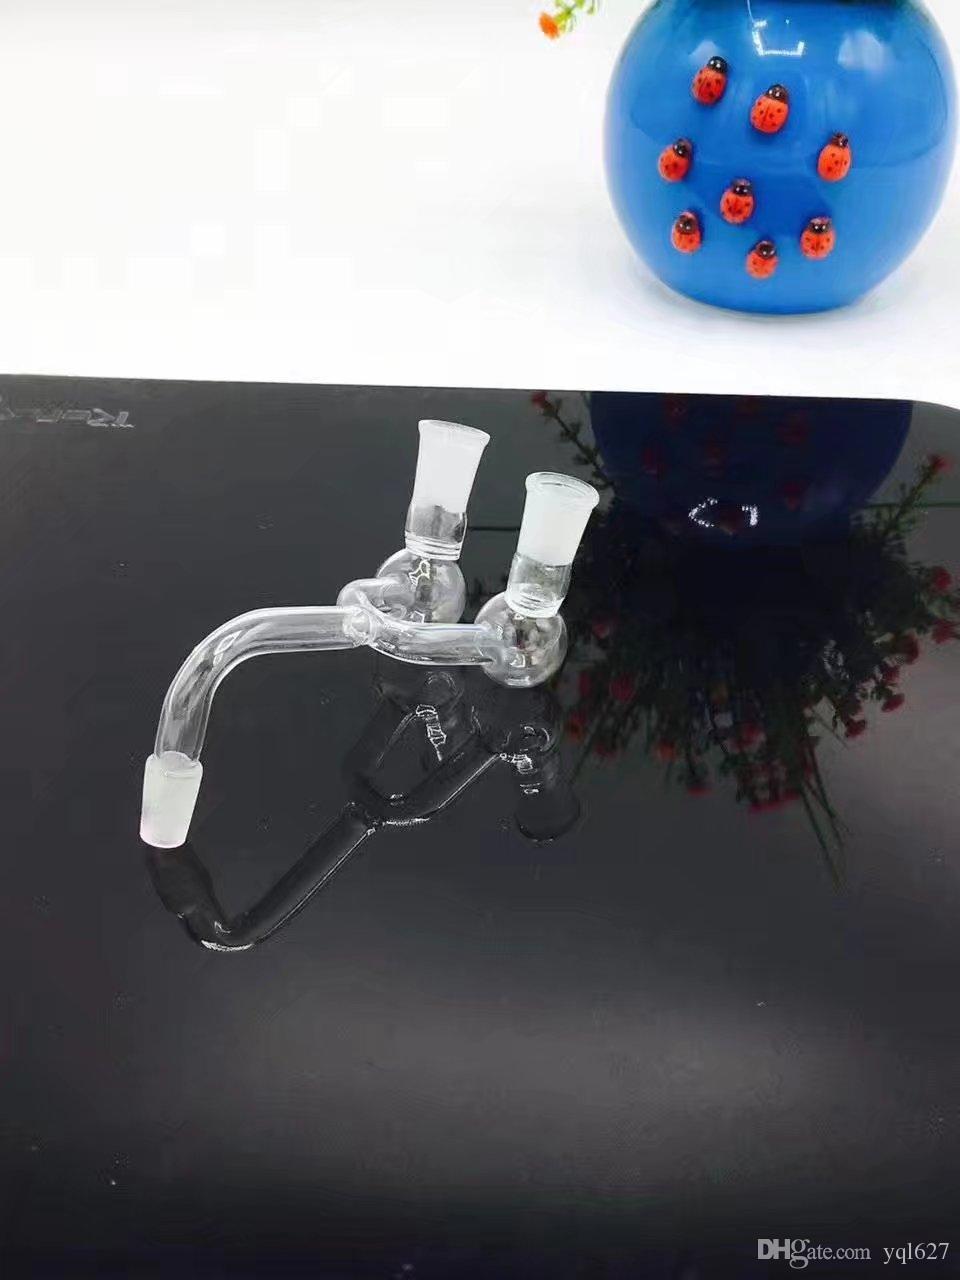 Slingshot filter glass bongs accessories  , Wholesale glass bongs accessories, glass hookah, water pipe smoke